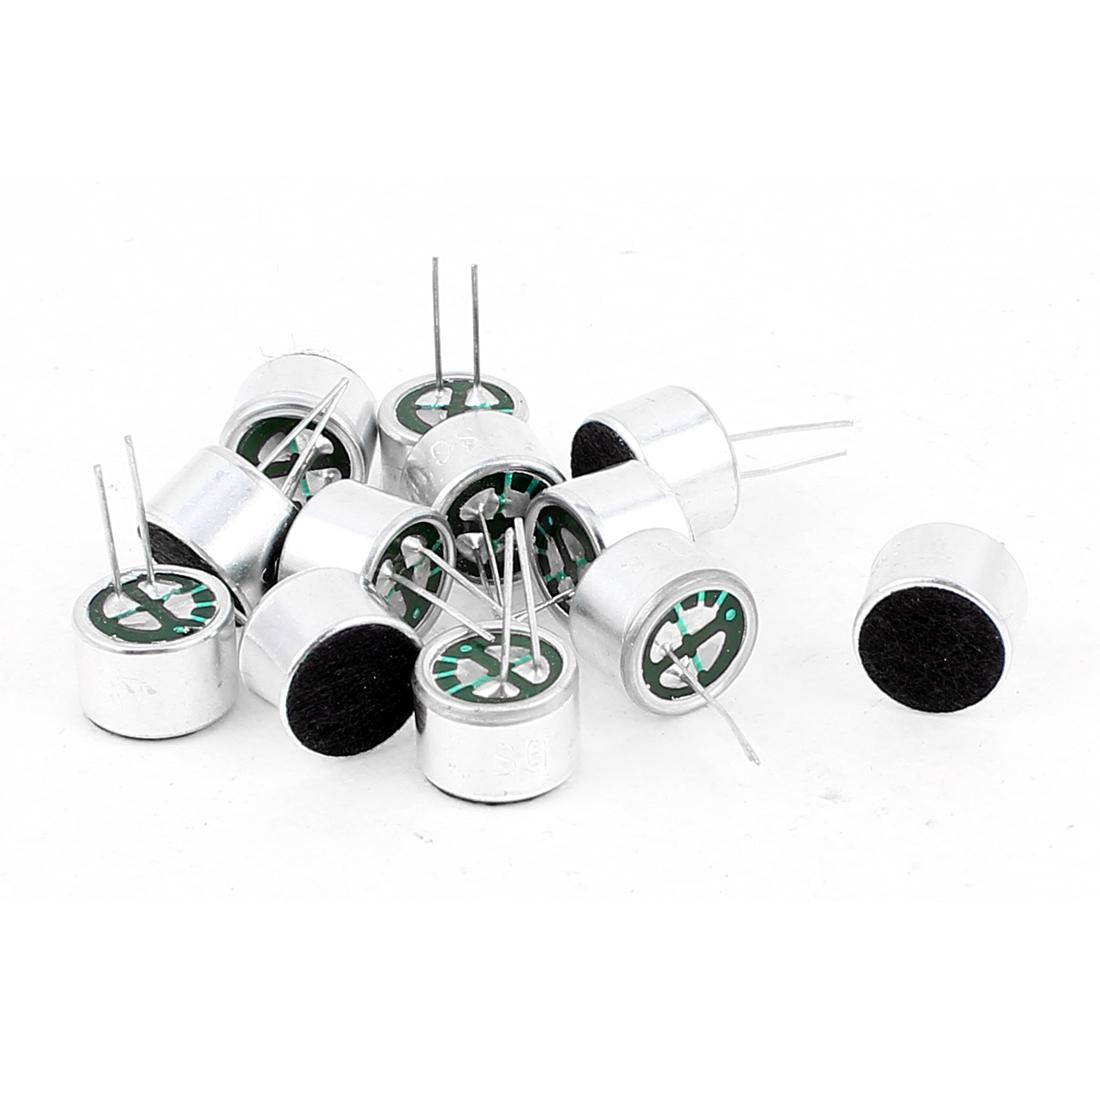 12 Pcs 10mm x 7mm Through Hole Mini Electret Microphone Condenser Pickup